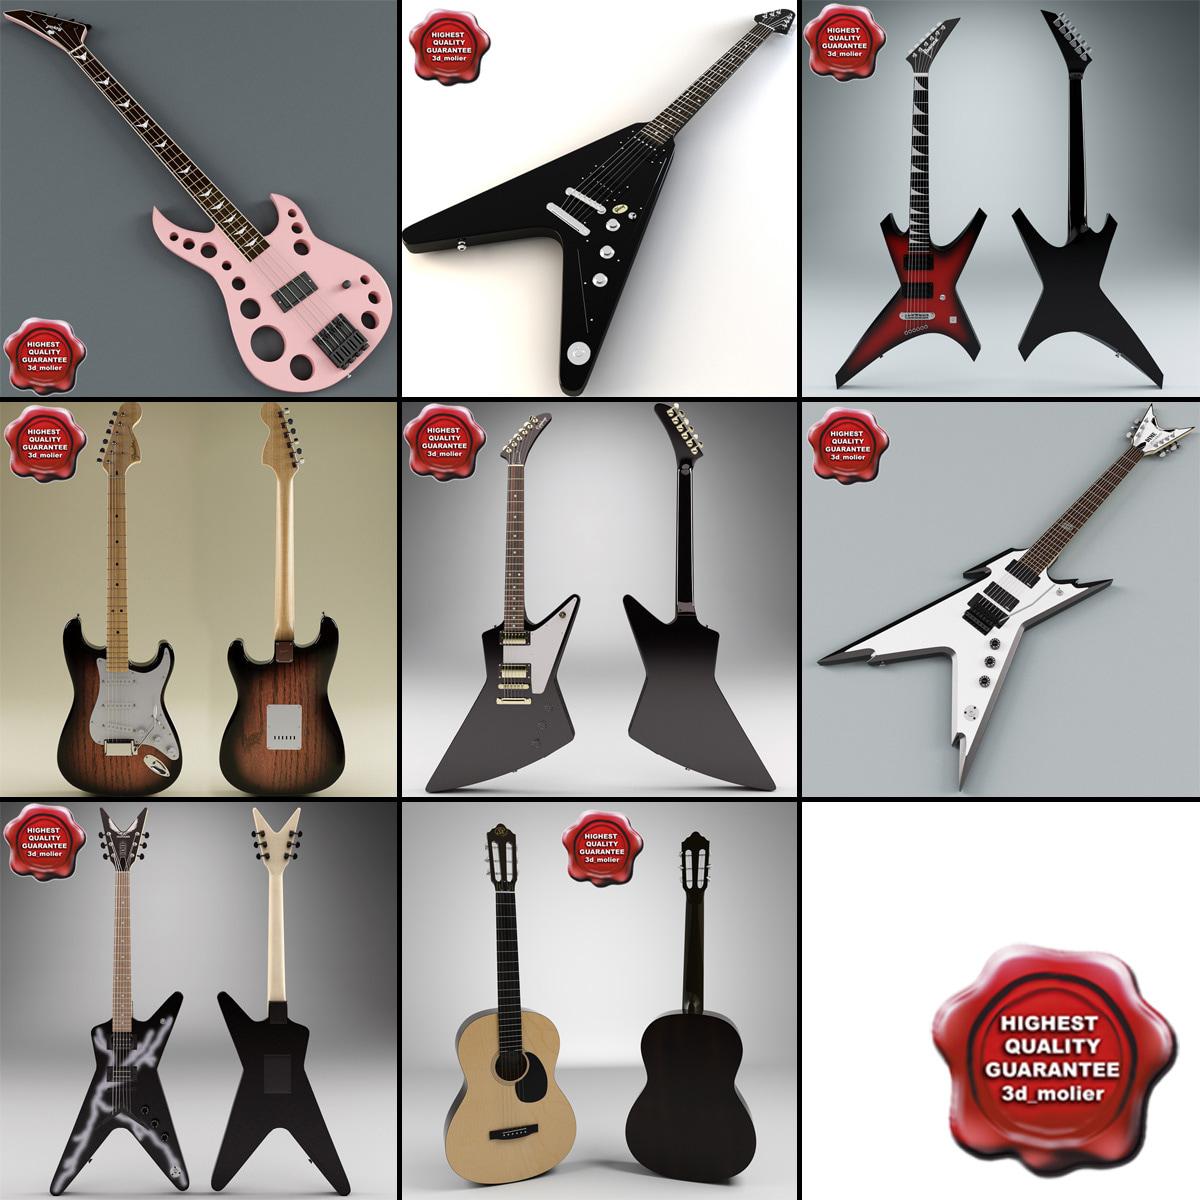 3ds max guitars v3